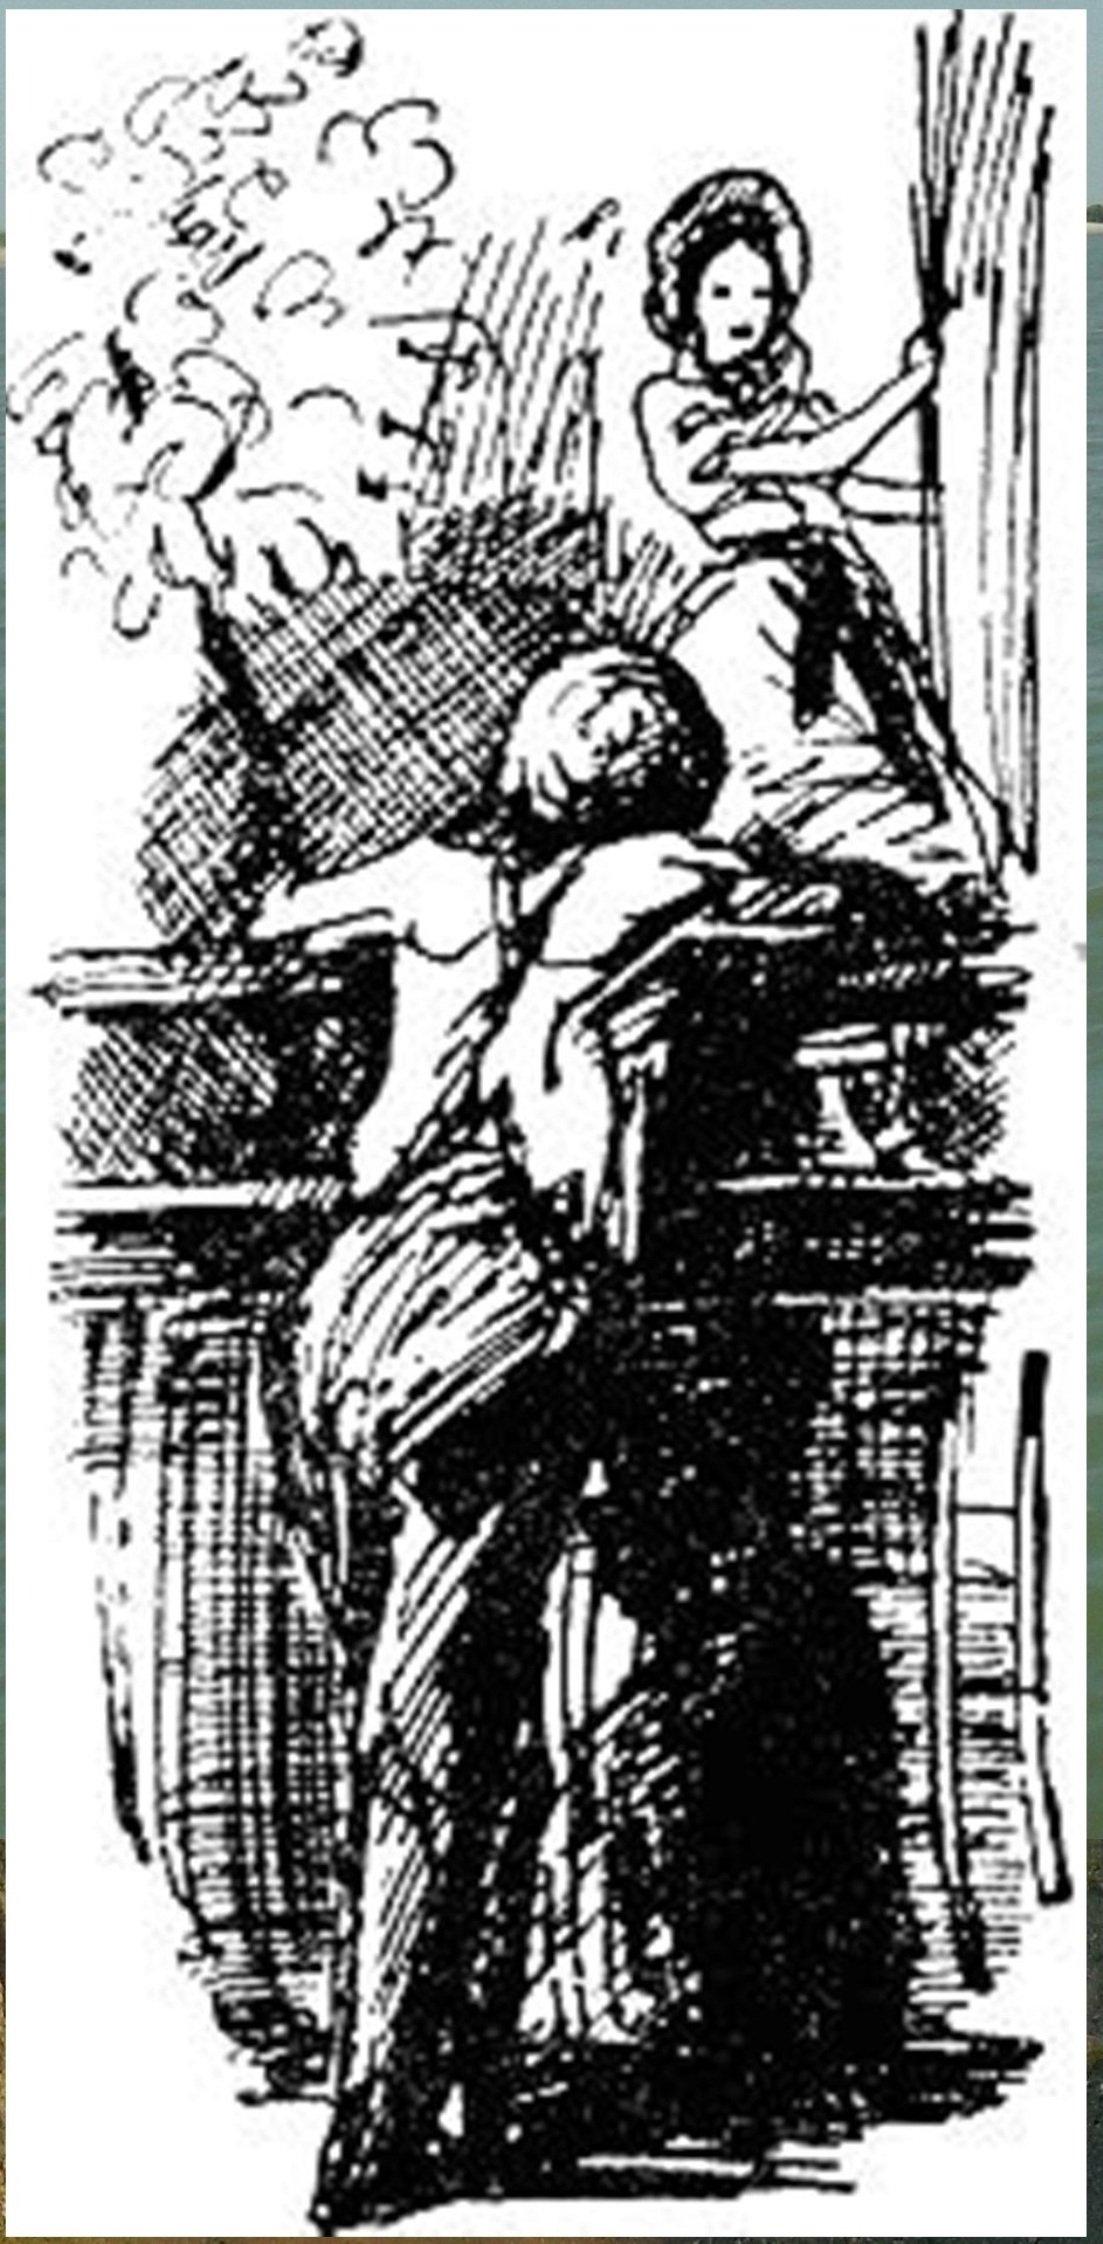 Иллюстрация В. Н. Горяева к пр-ю М.Твена Приключения Тома Сойера (7).